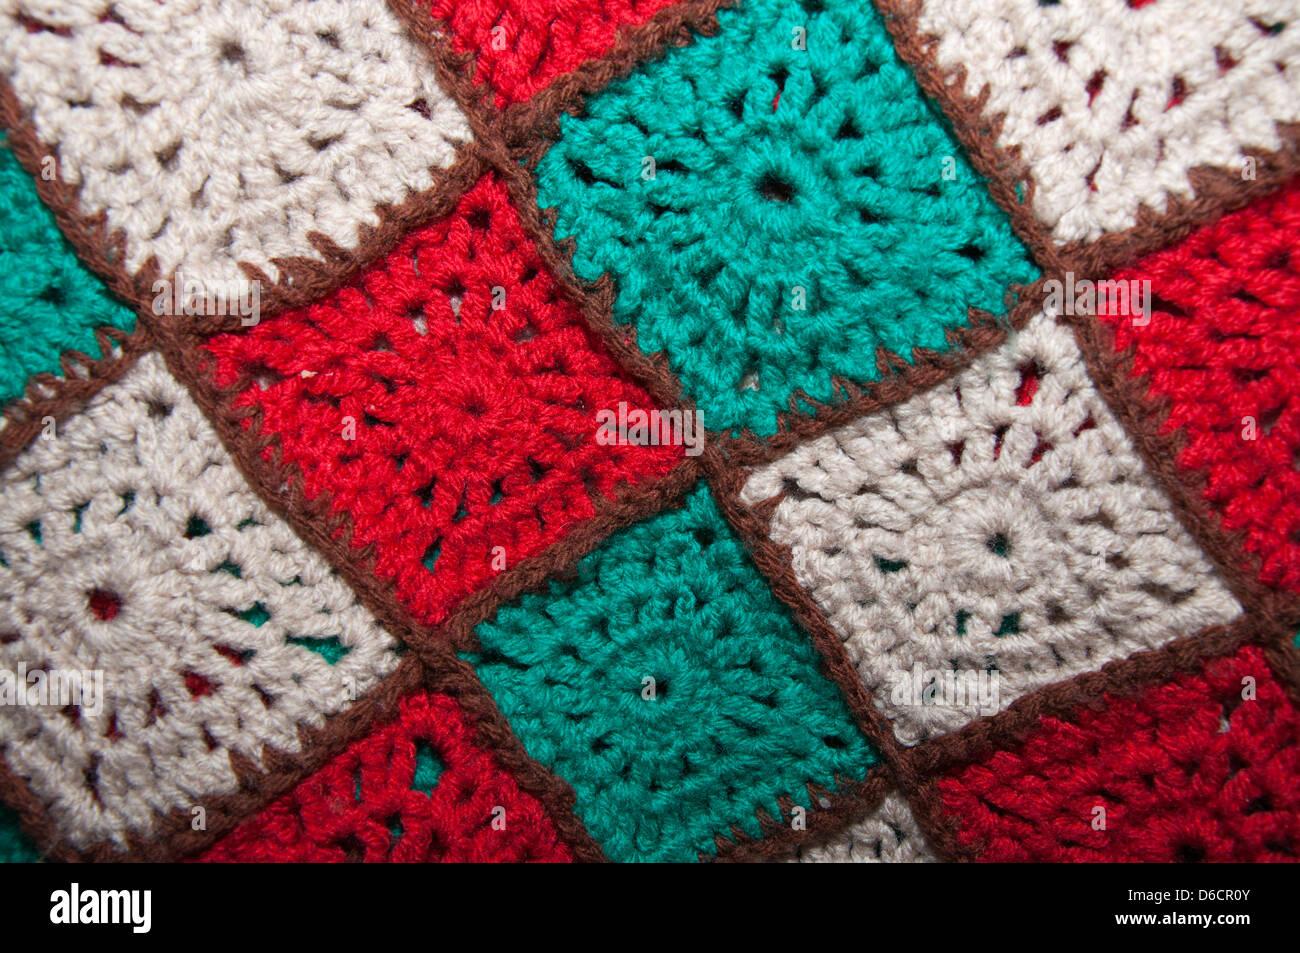 Häkeln Hand Made Wolle Decke Quadrate Abstrakt Multi Farbige